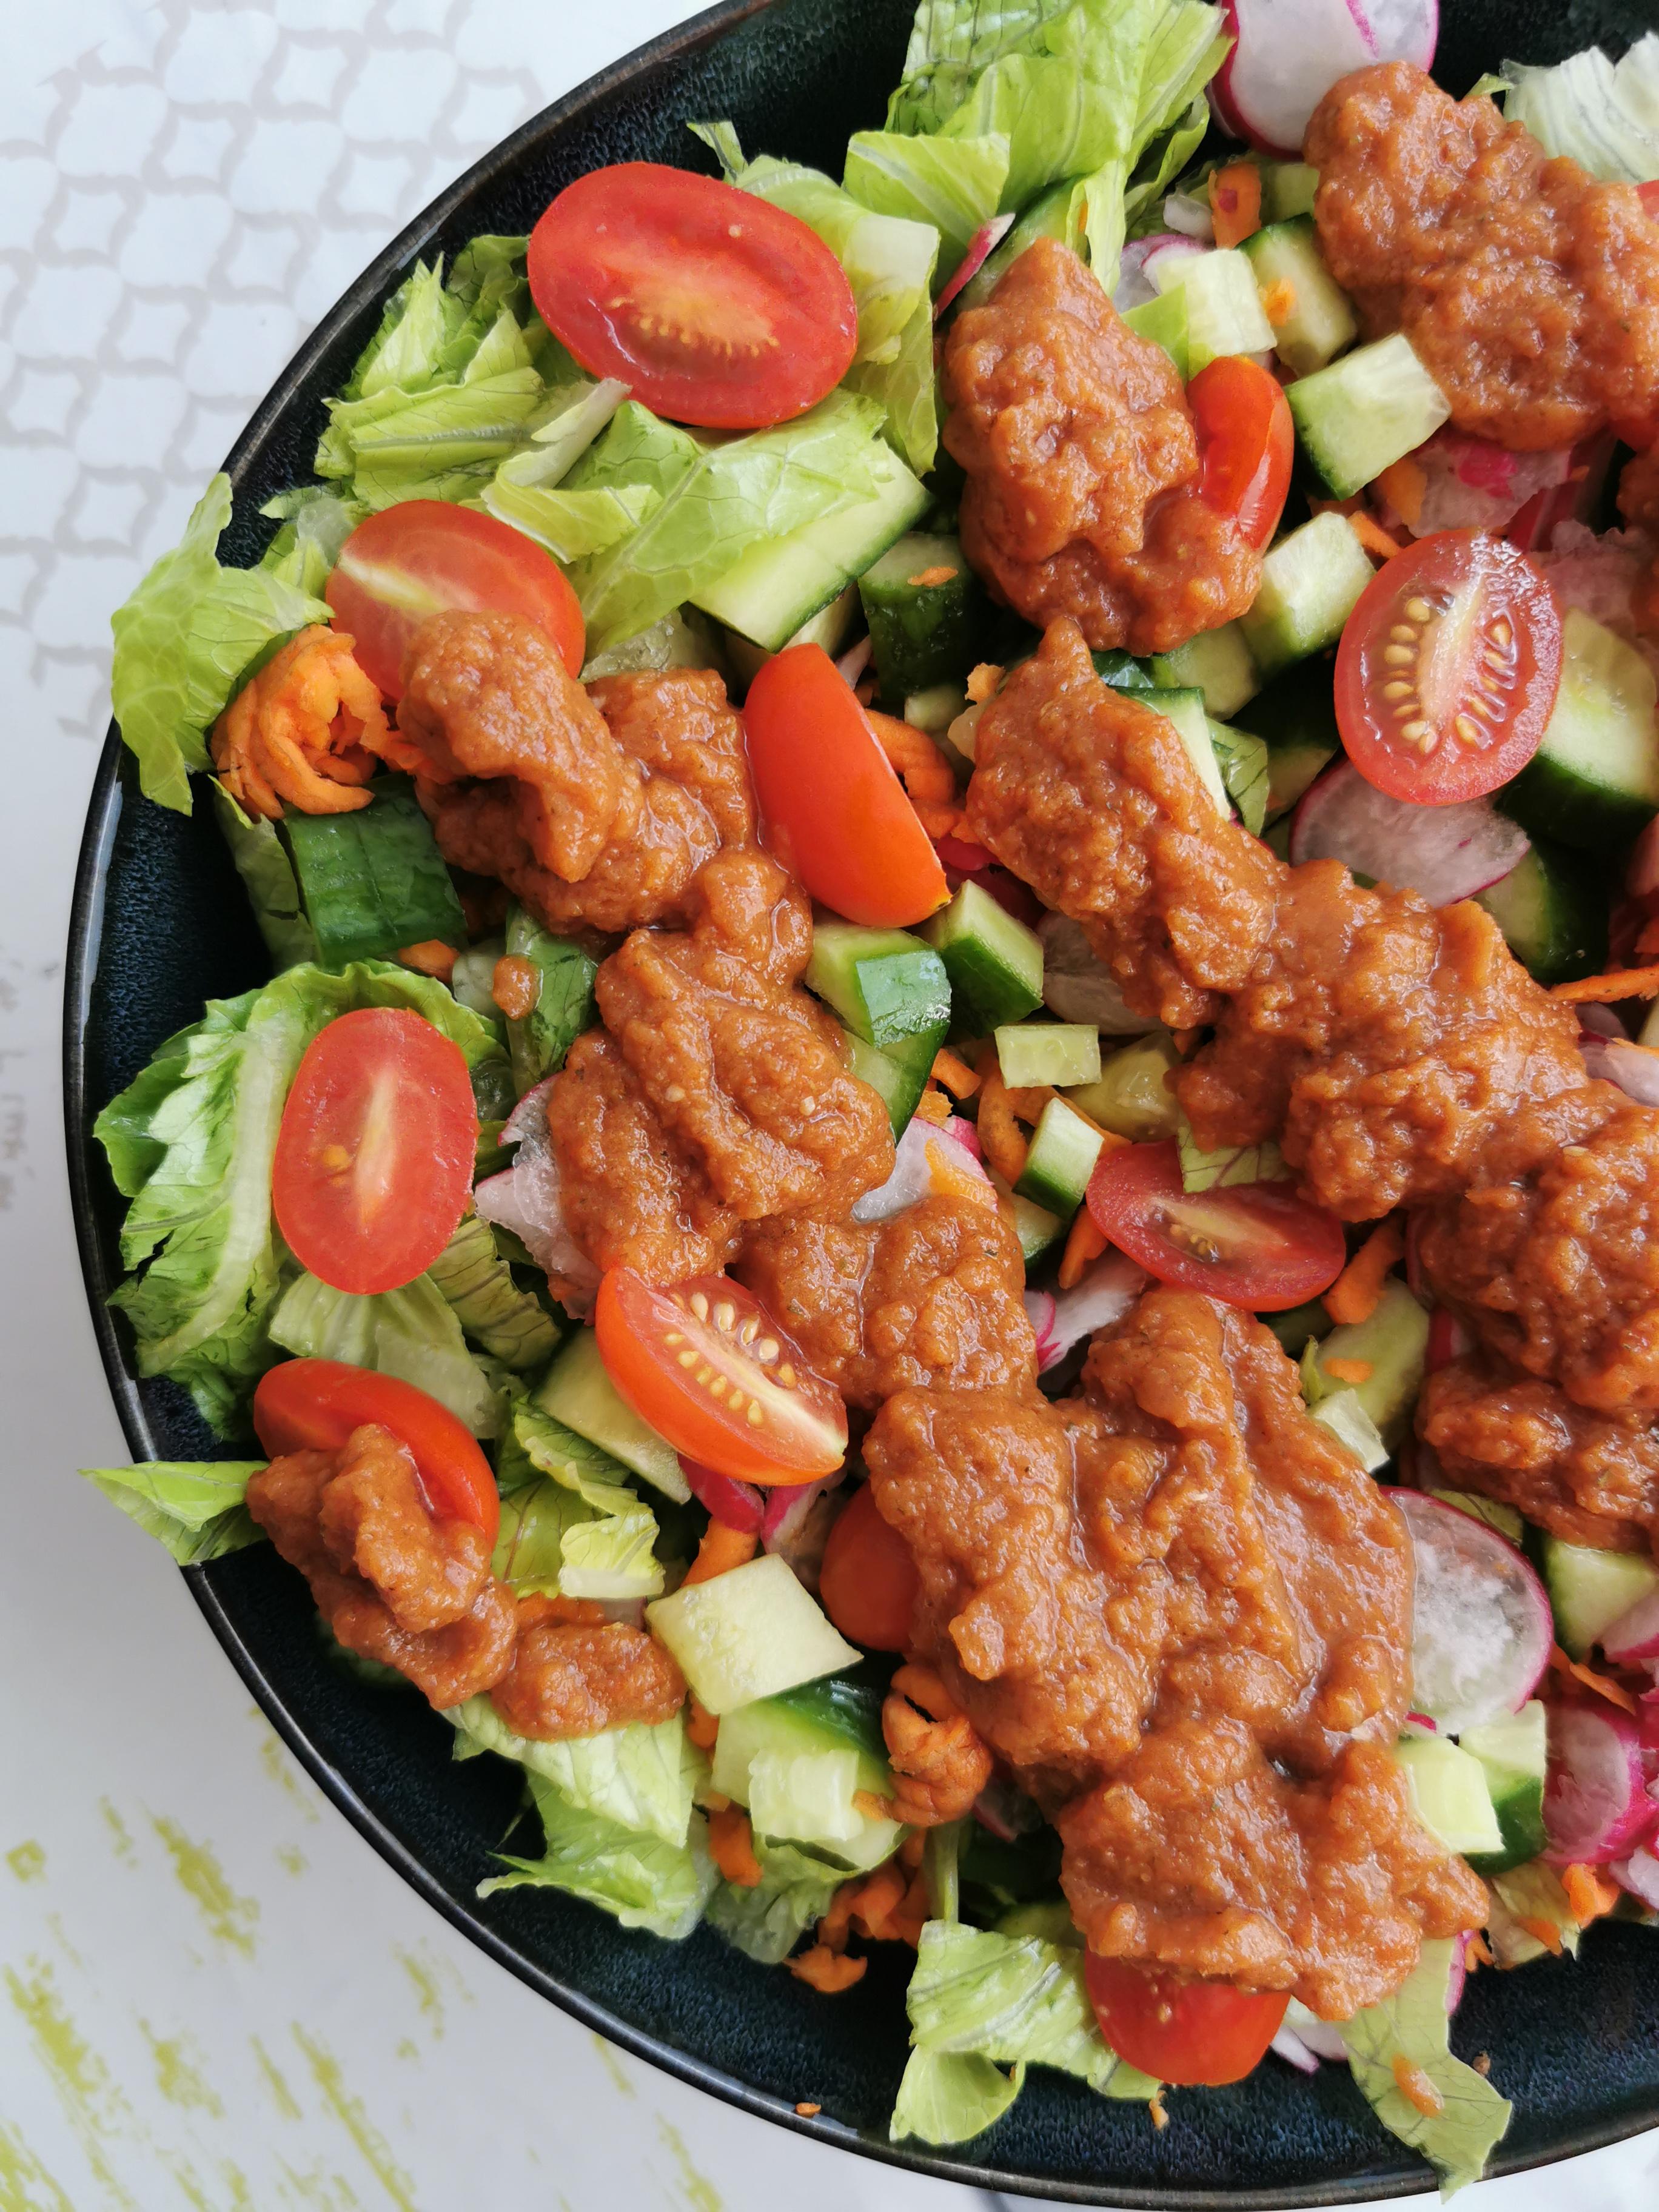 zoom salade sauce barbecue crue vegan sans gluten sans gras medical medium